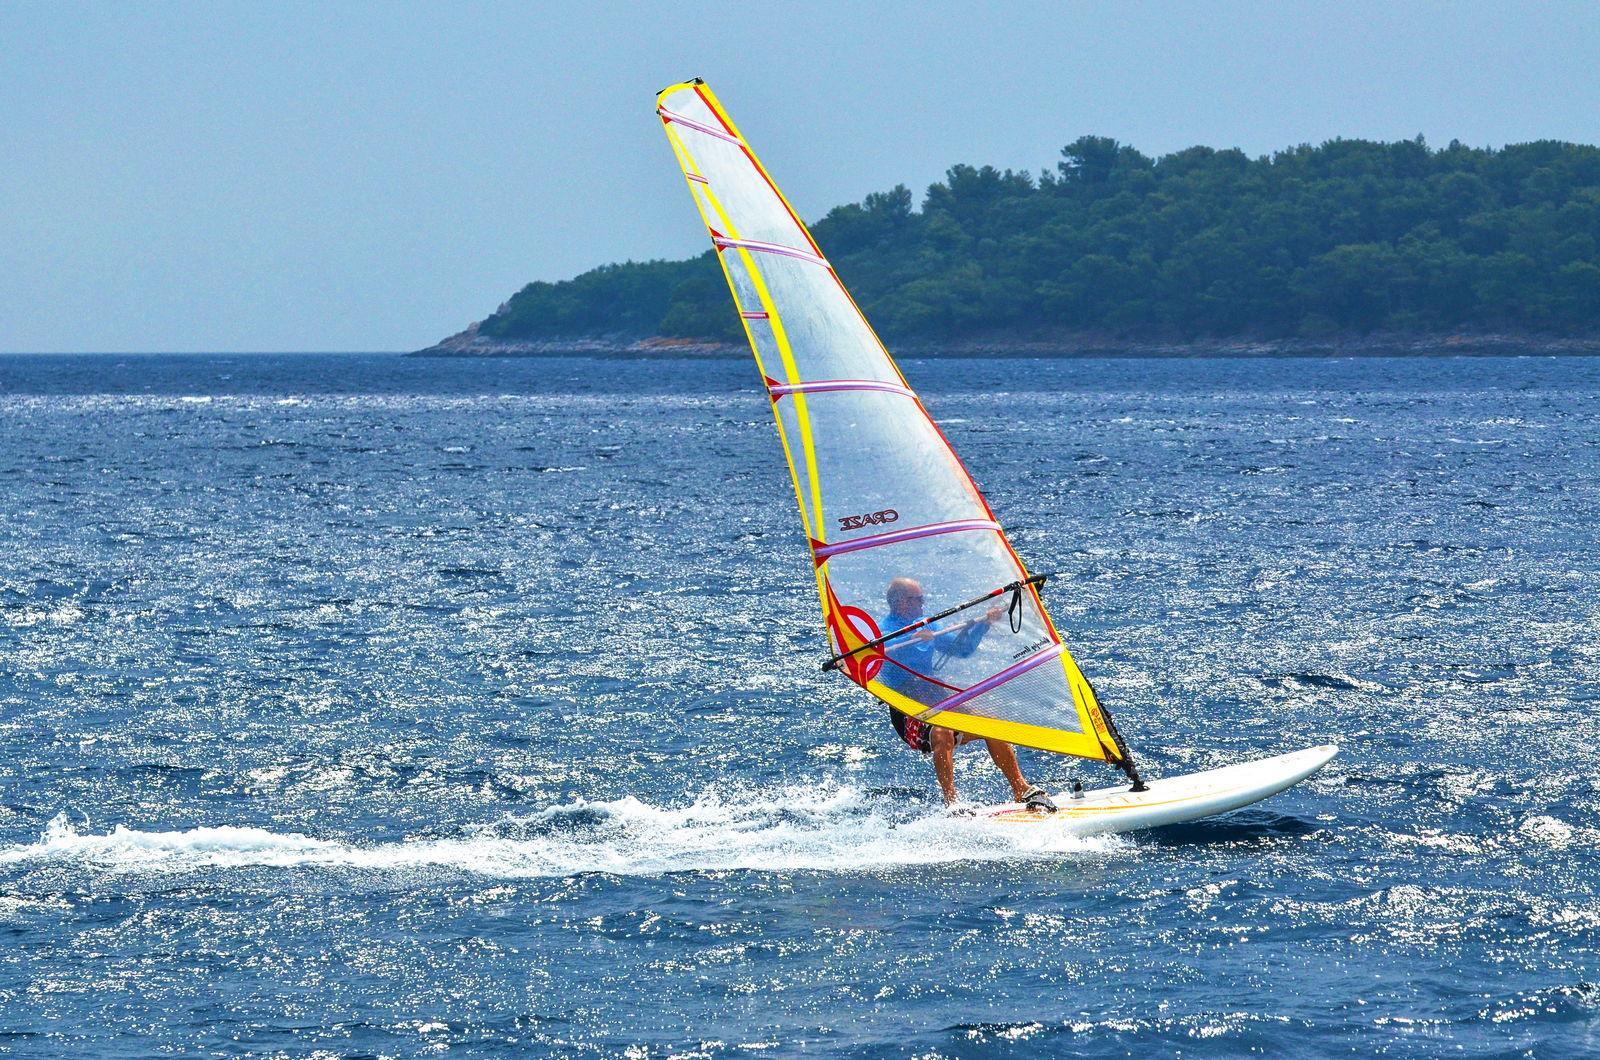 korcula windsurfing lessons extreme 06 - Christmas Windsurfing